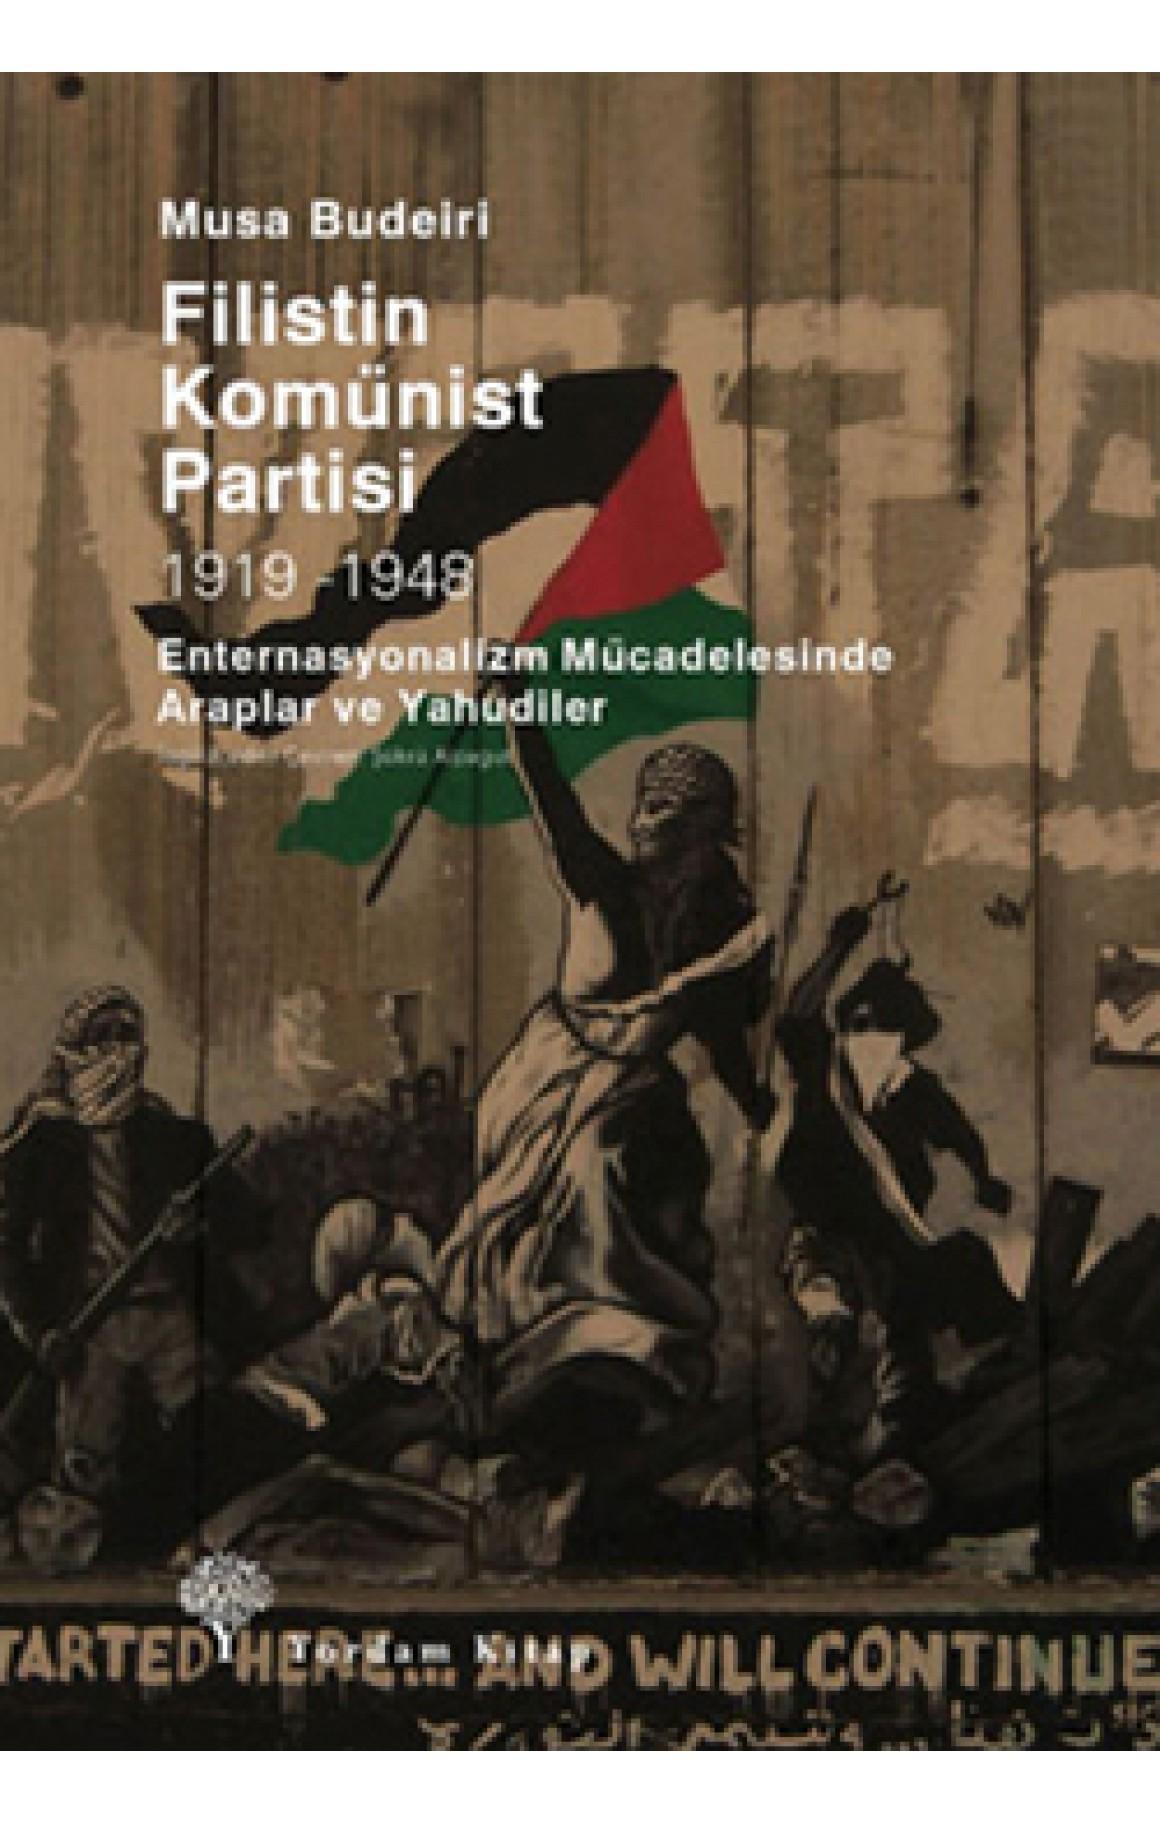 Filistin Komünist Partisi, 1919-1948